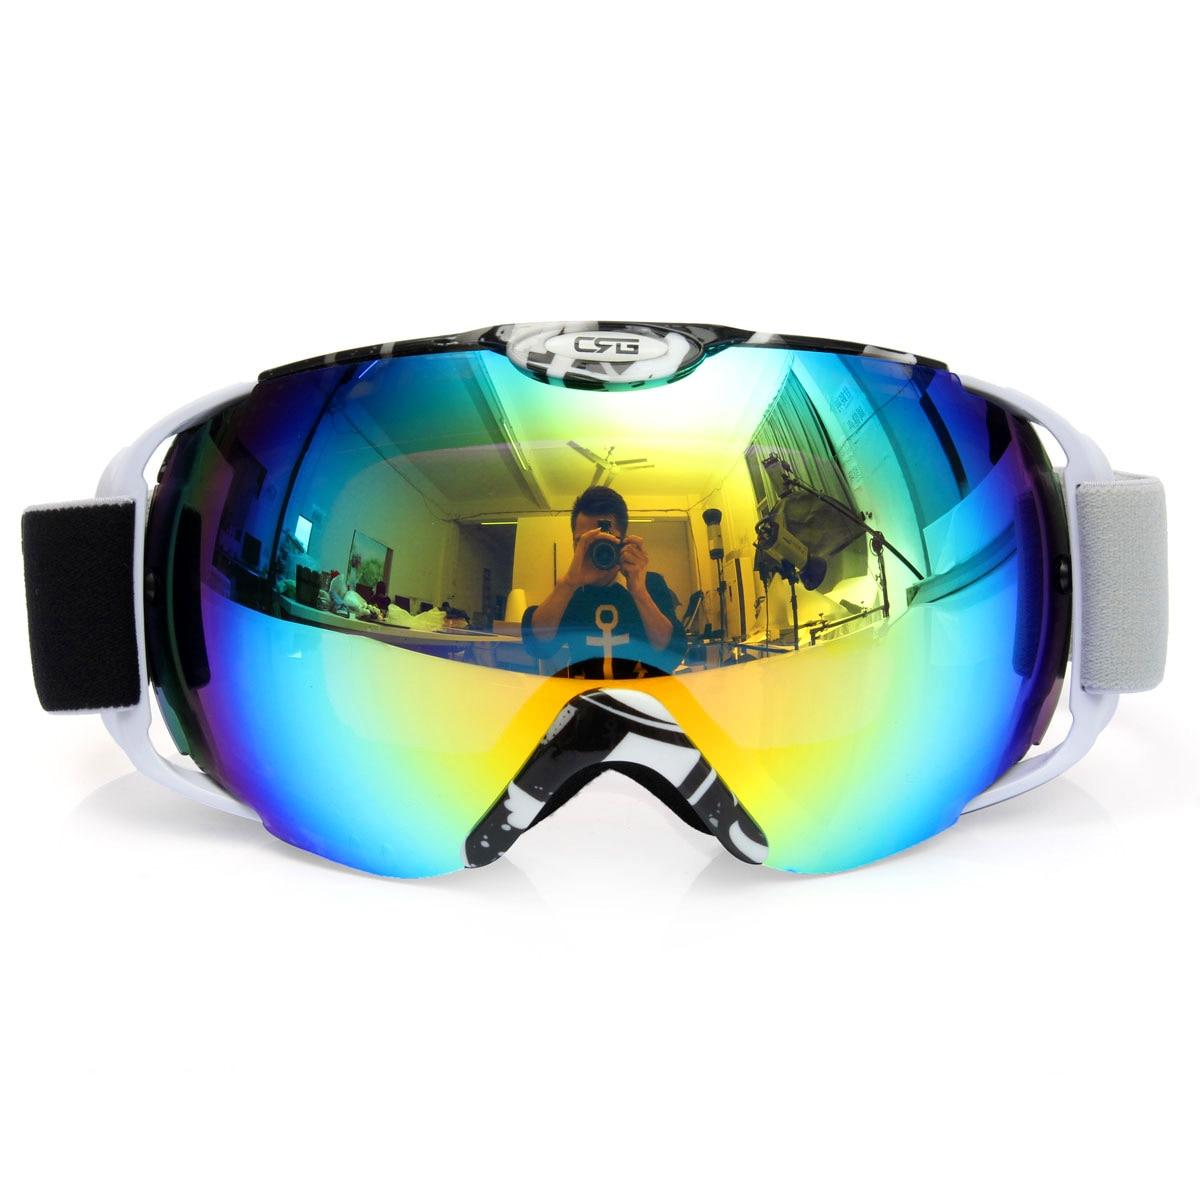 Best Affordable Ski Goggles 2017